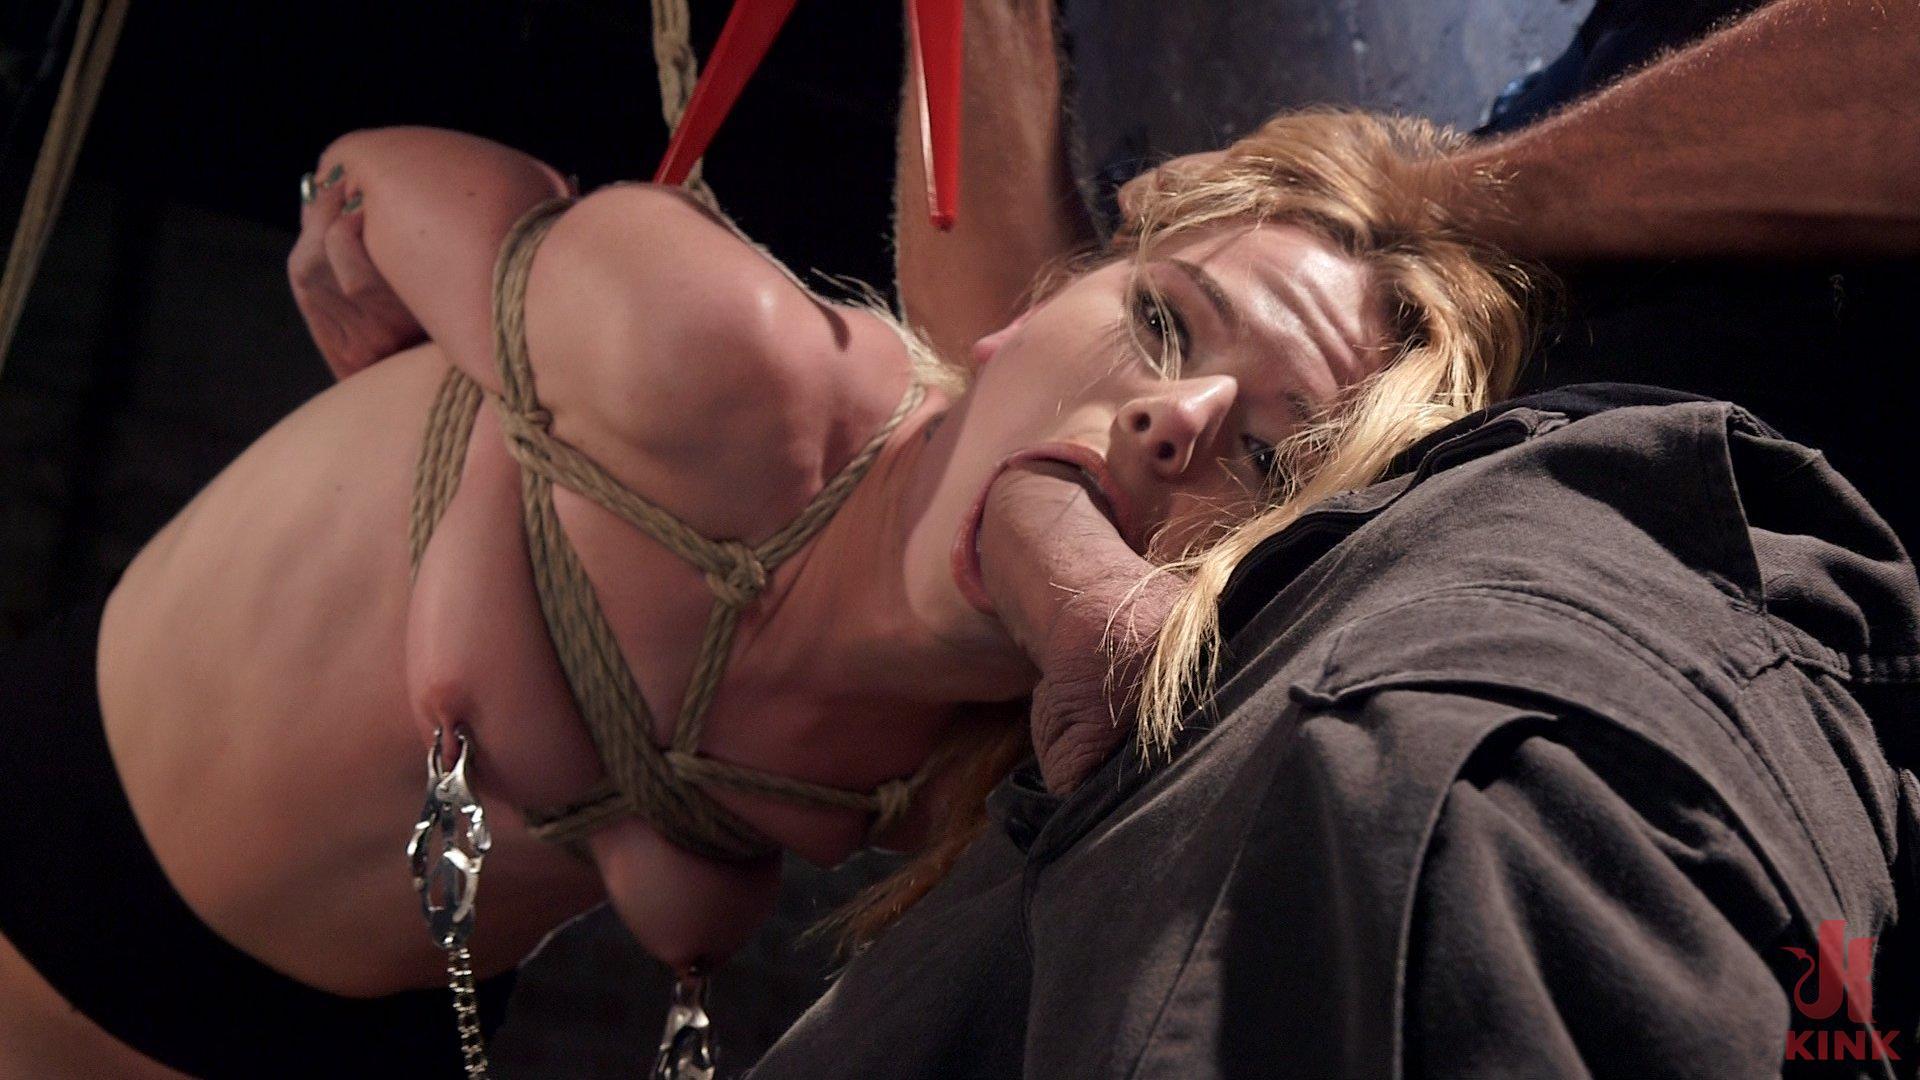 sex positions she loves sex slave training